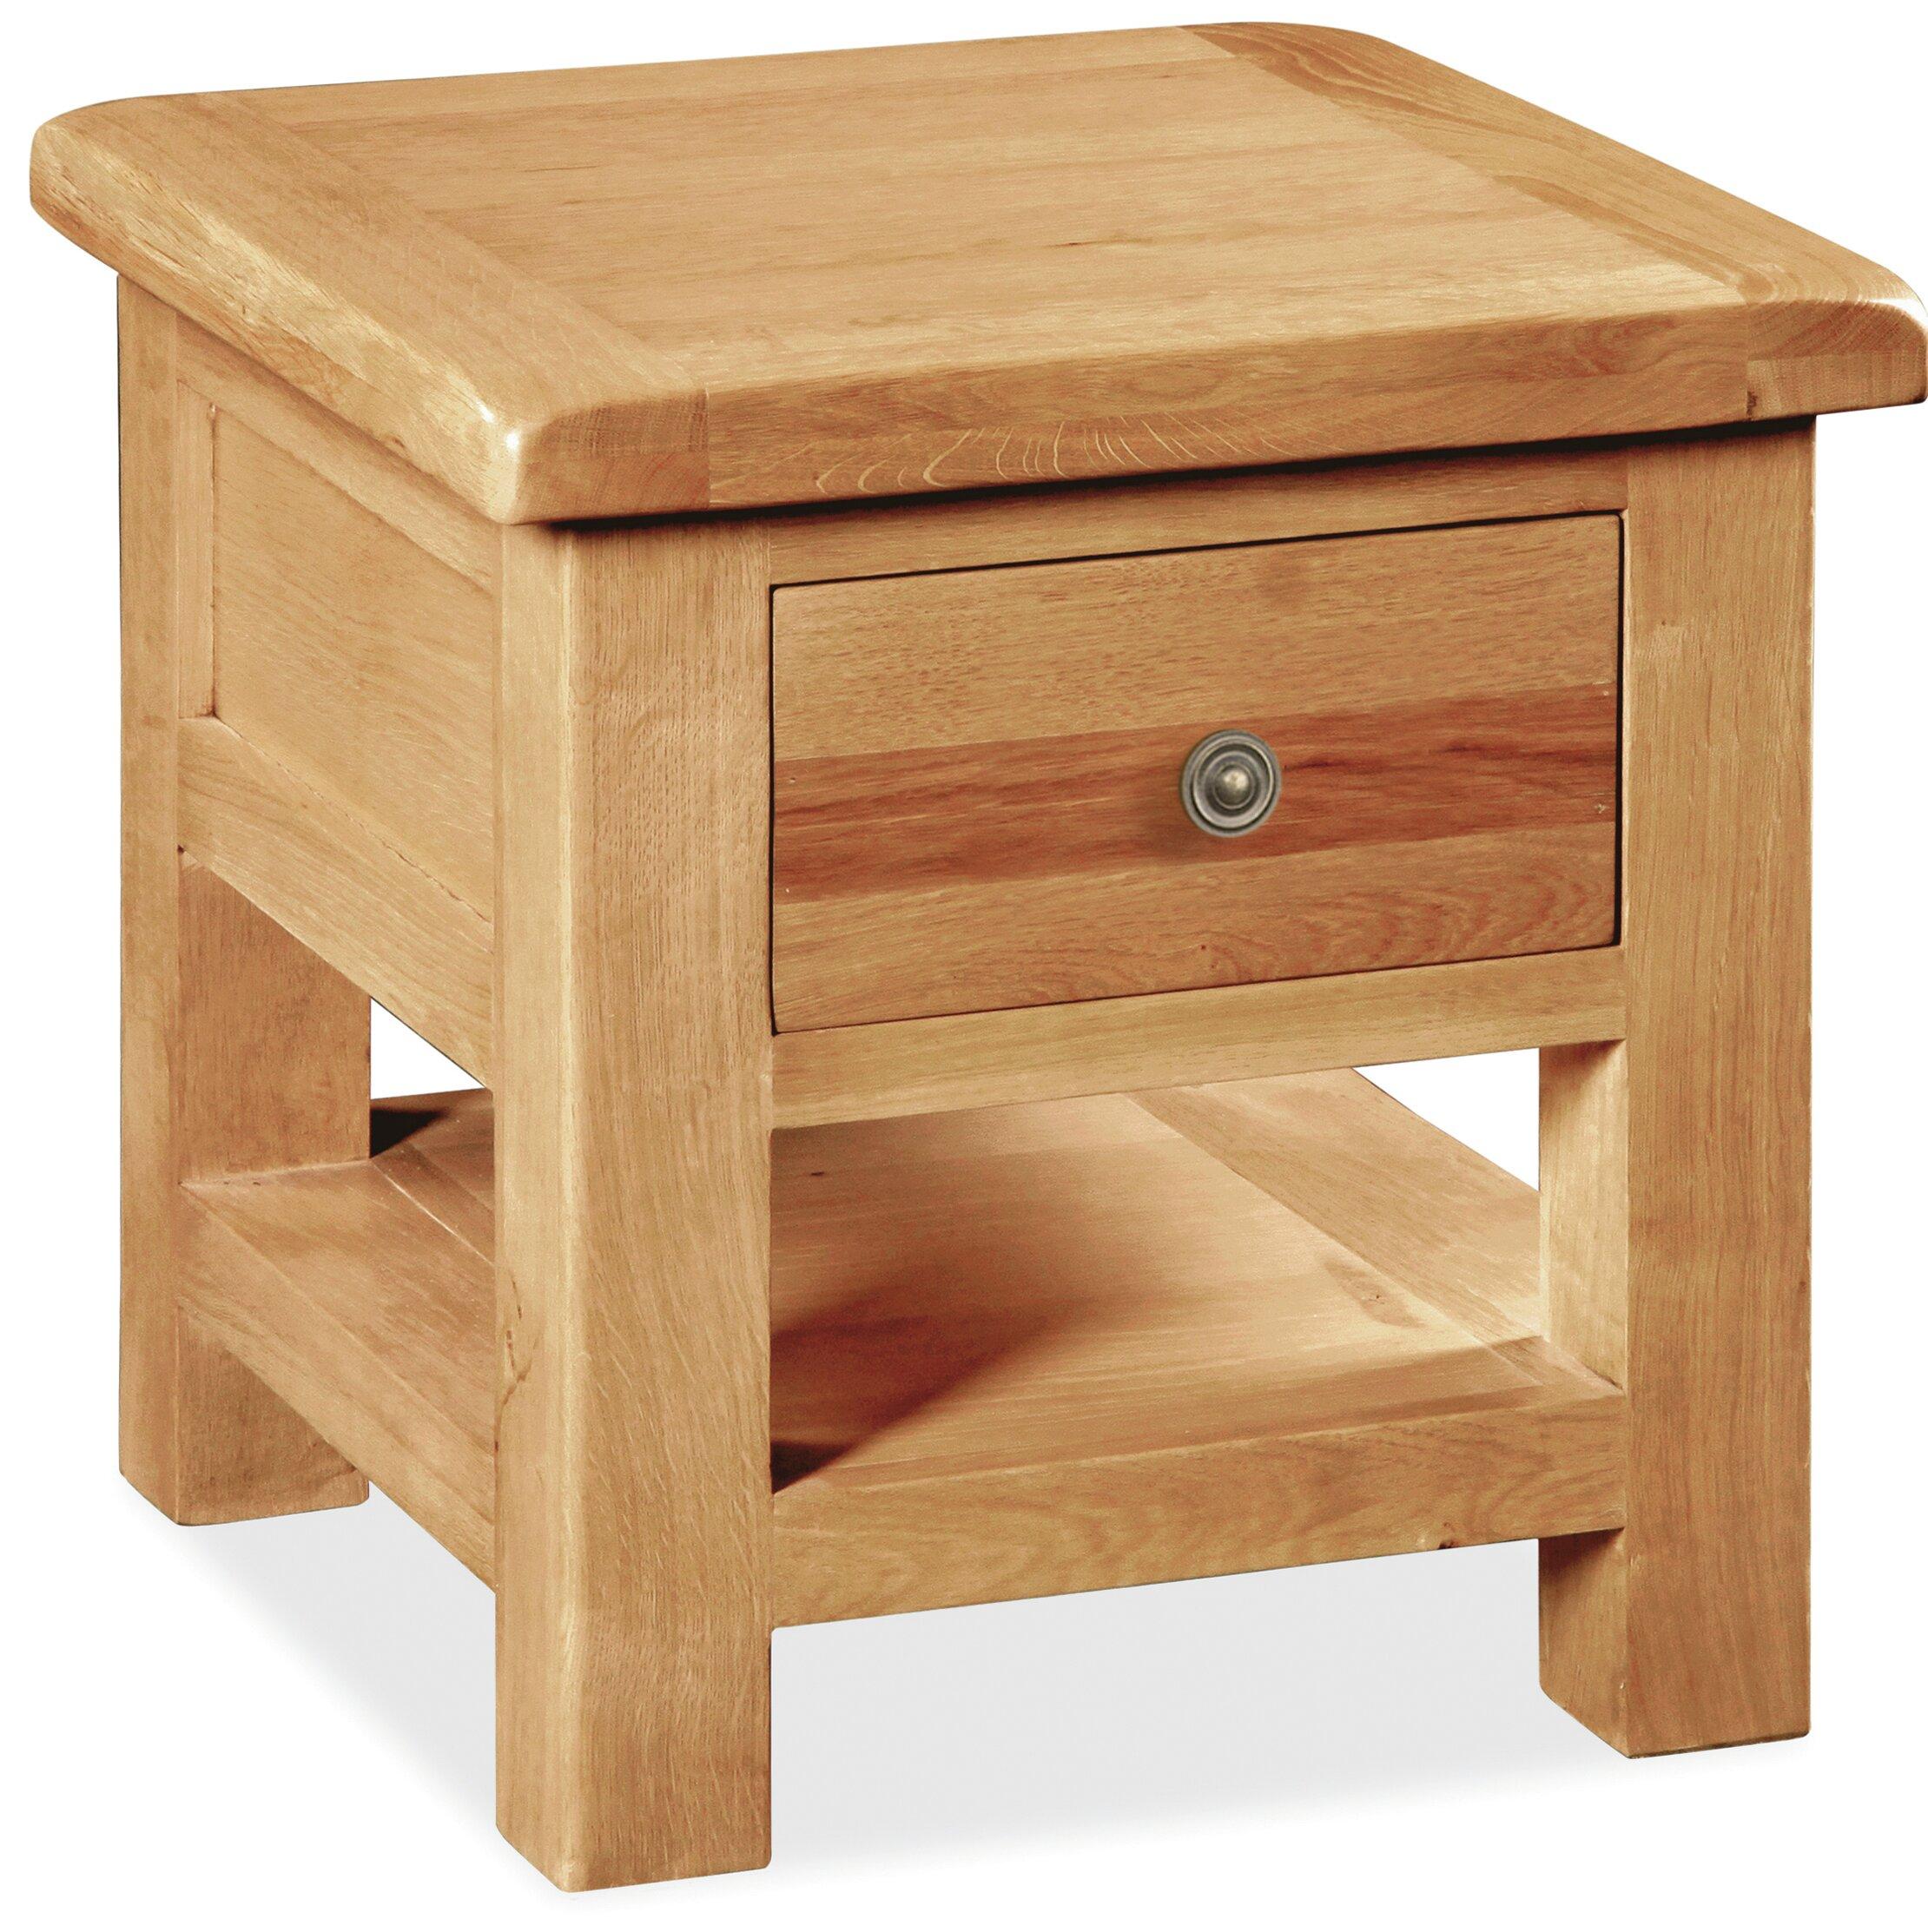 Gracie Oaks Della 1 Drawer Bedside Table Wayfair Co Uk